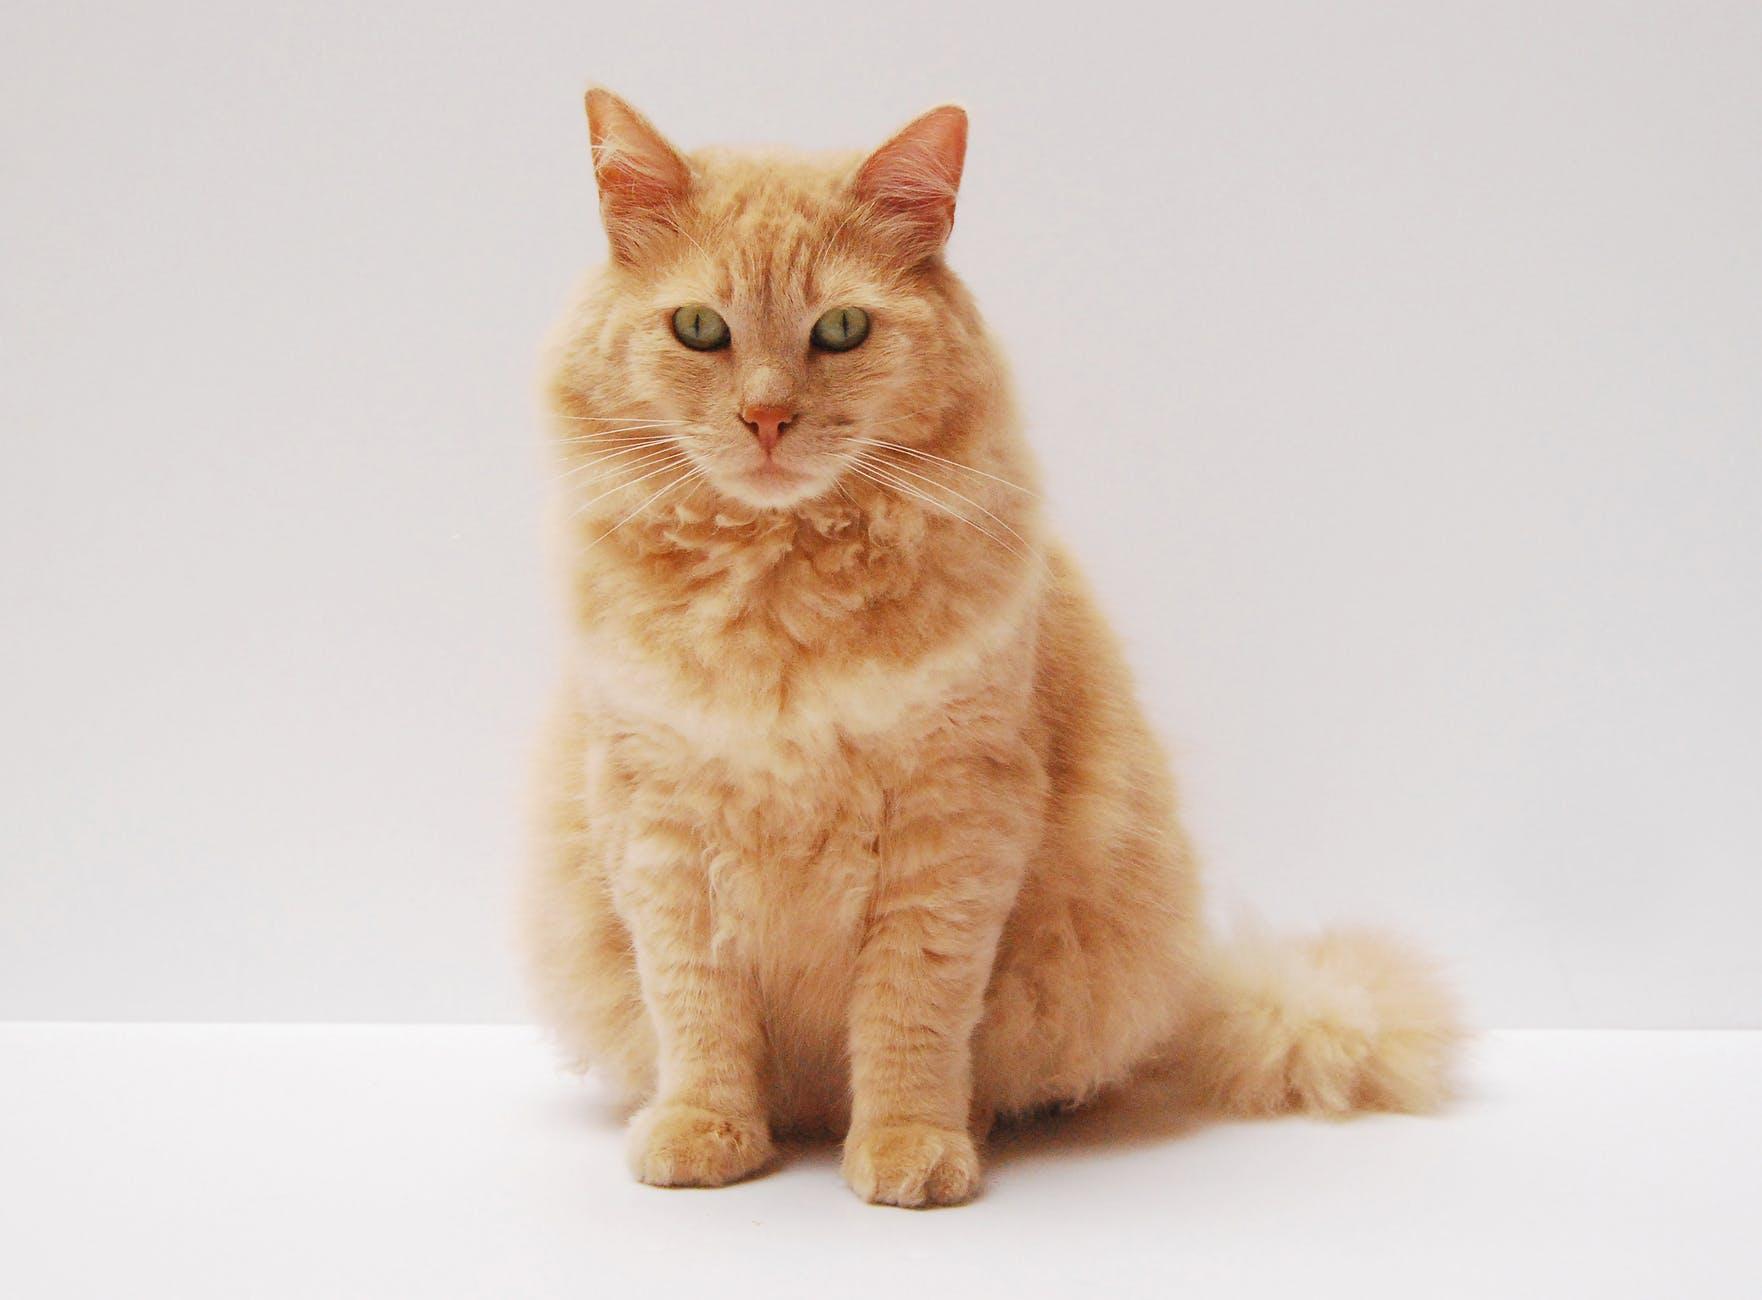 adorable animal animal photography cat